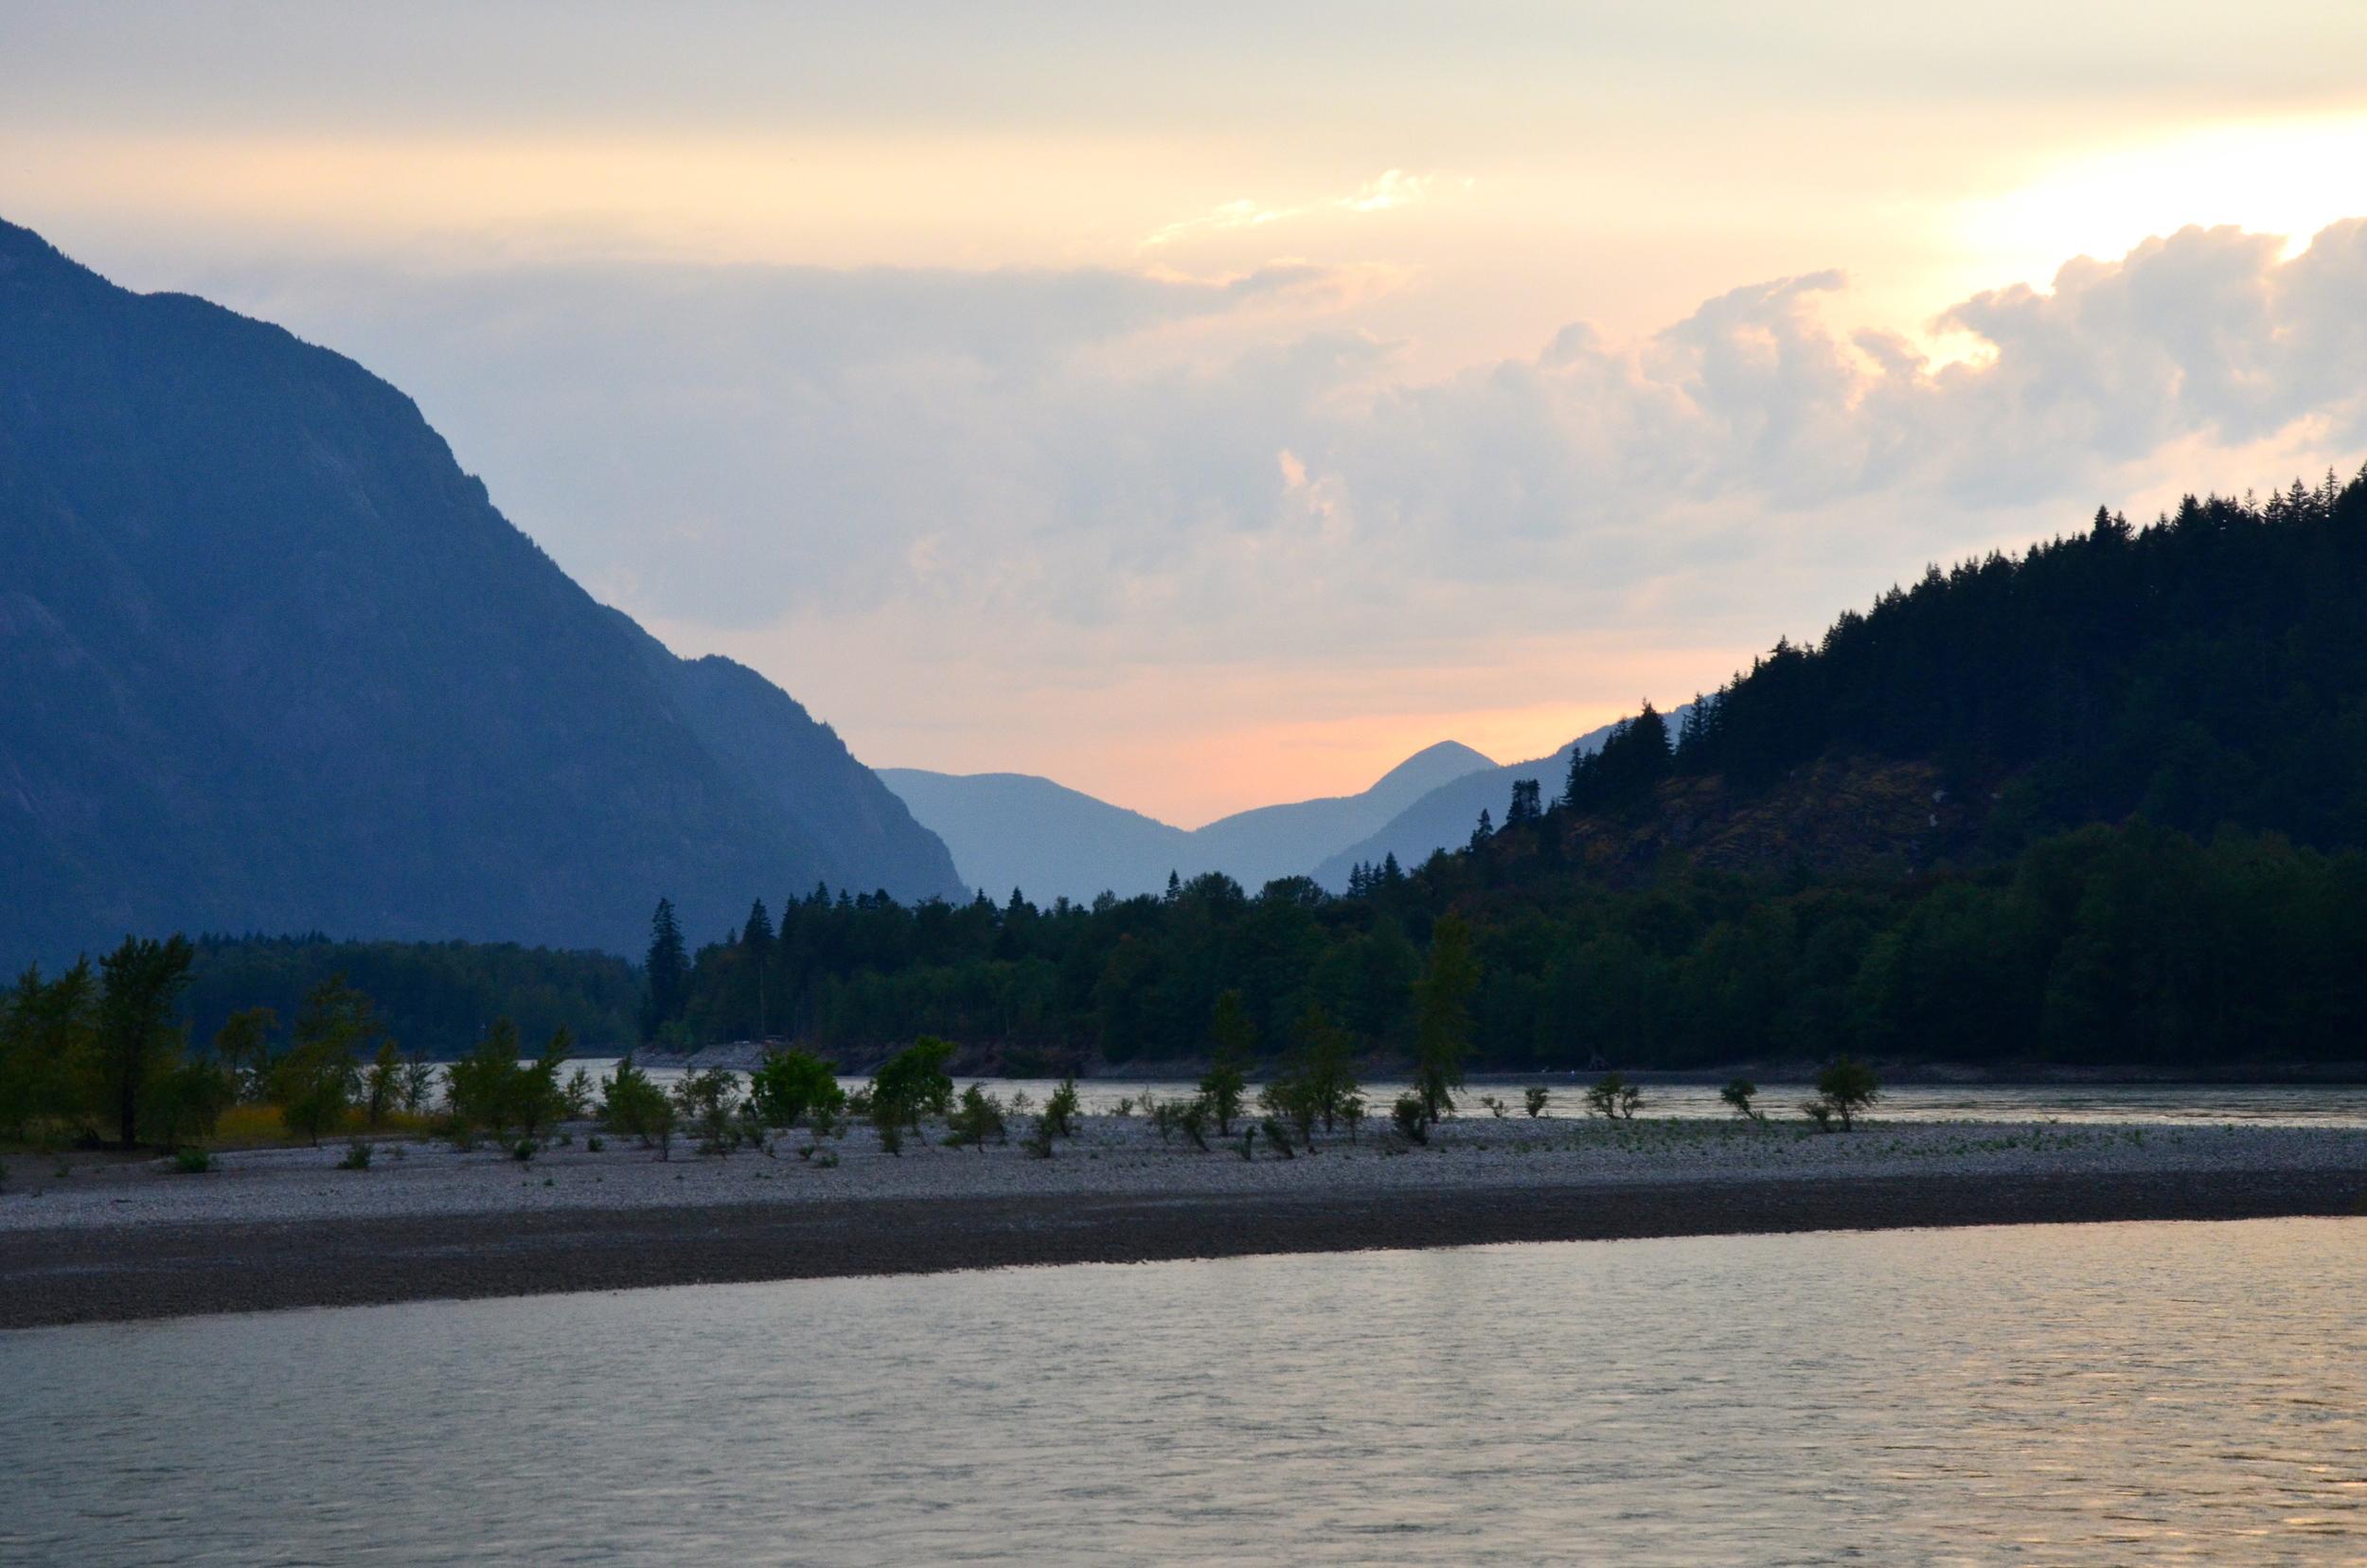 Fraser River,  Hope British Columbia, Canada